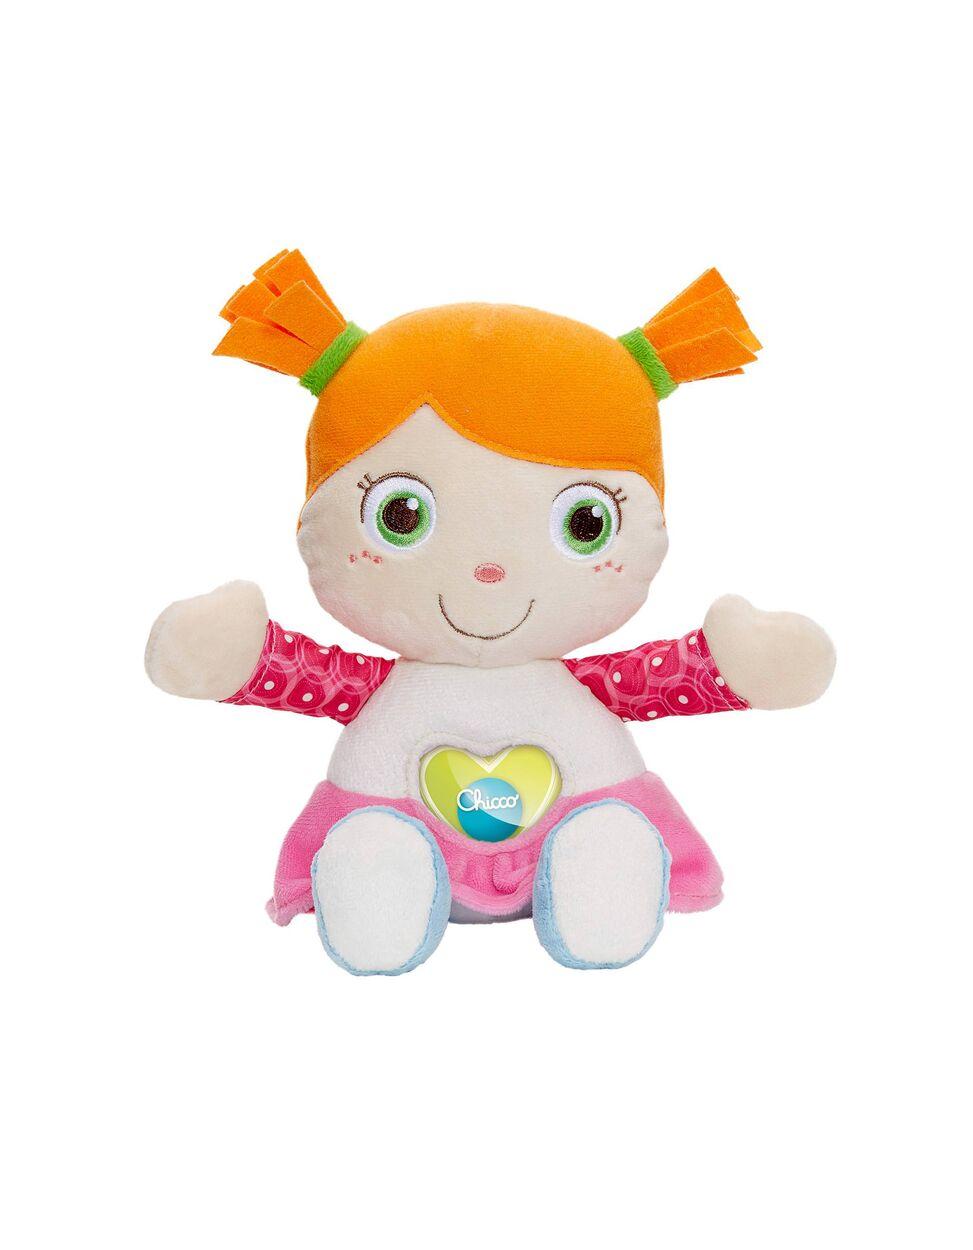 Chicco brinquedo First Love Boneca Passeio